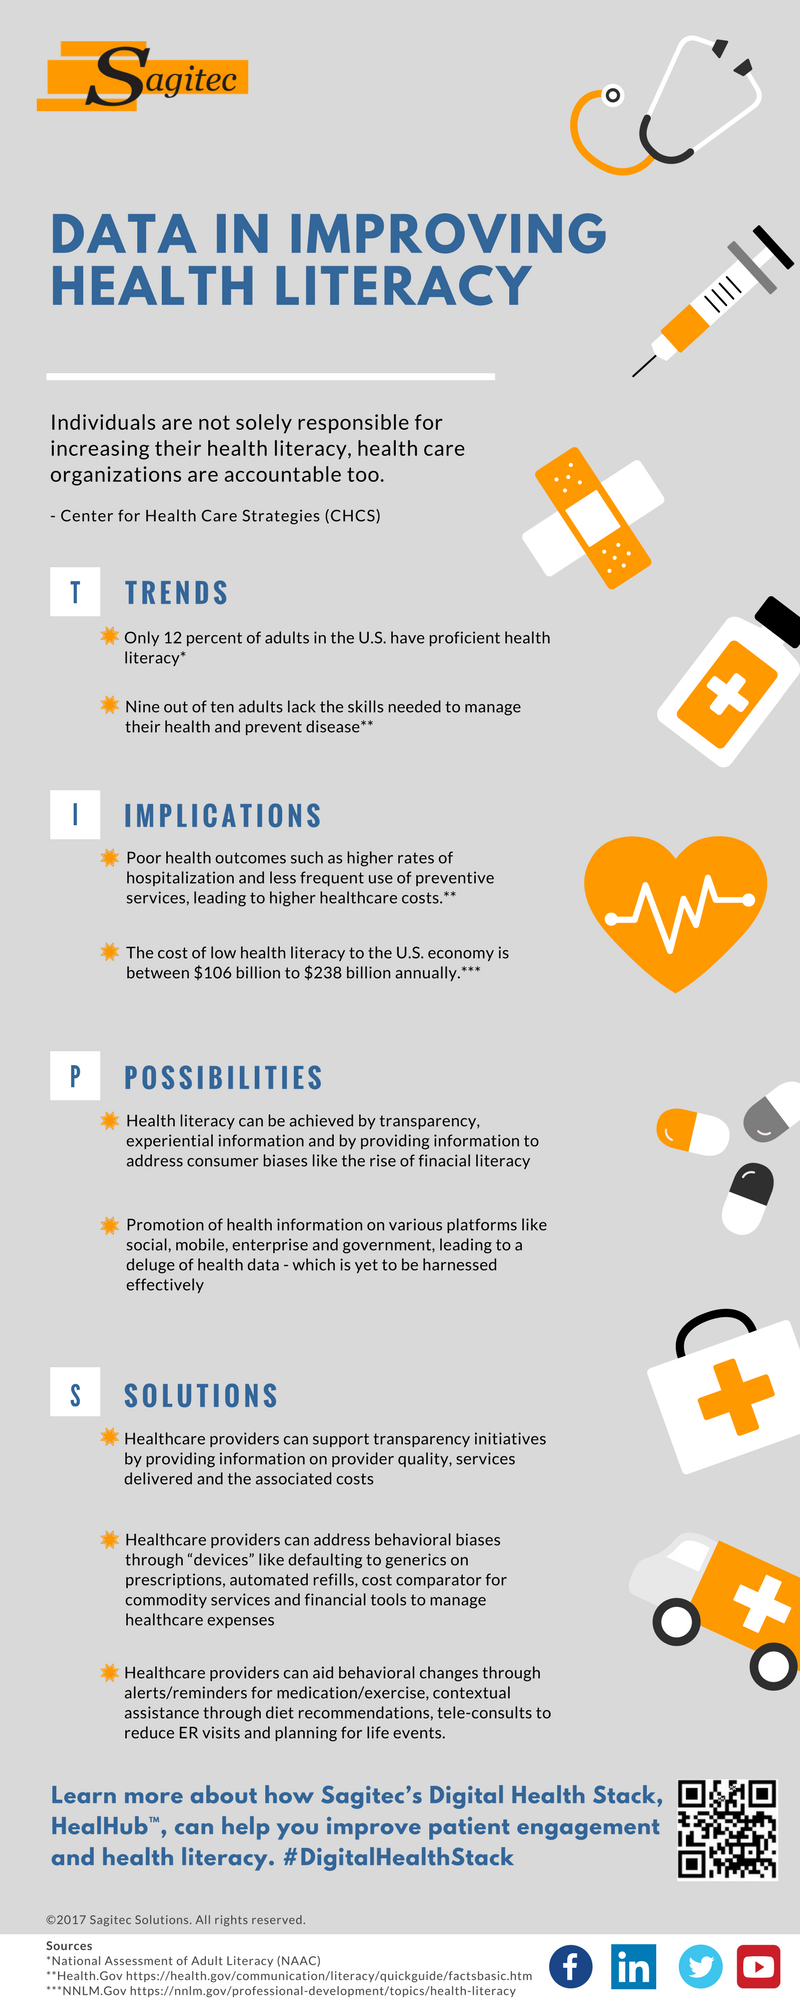 Health literacy infographic, HealthLiteracy, data analytics, digital health stack, patient engagement